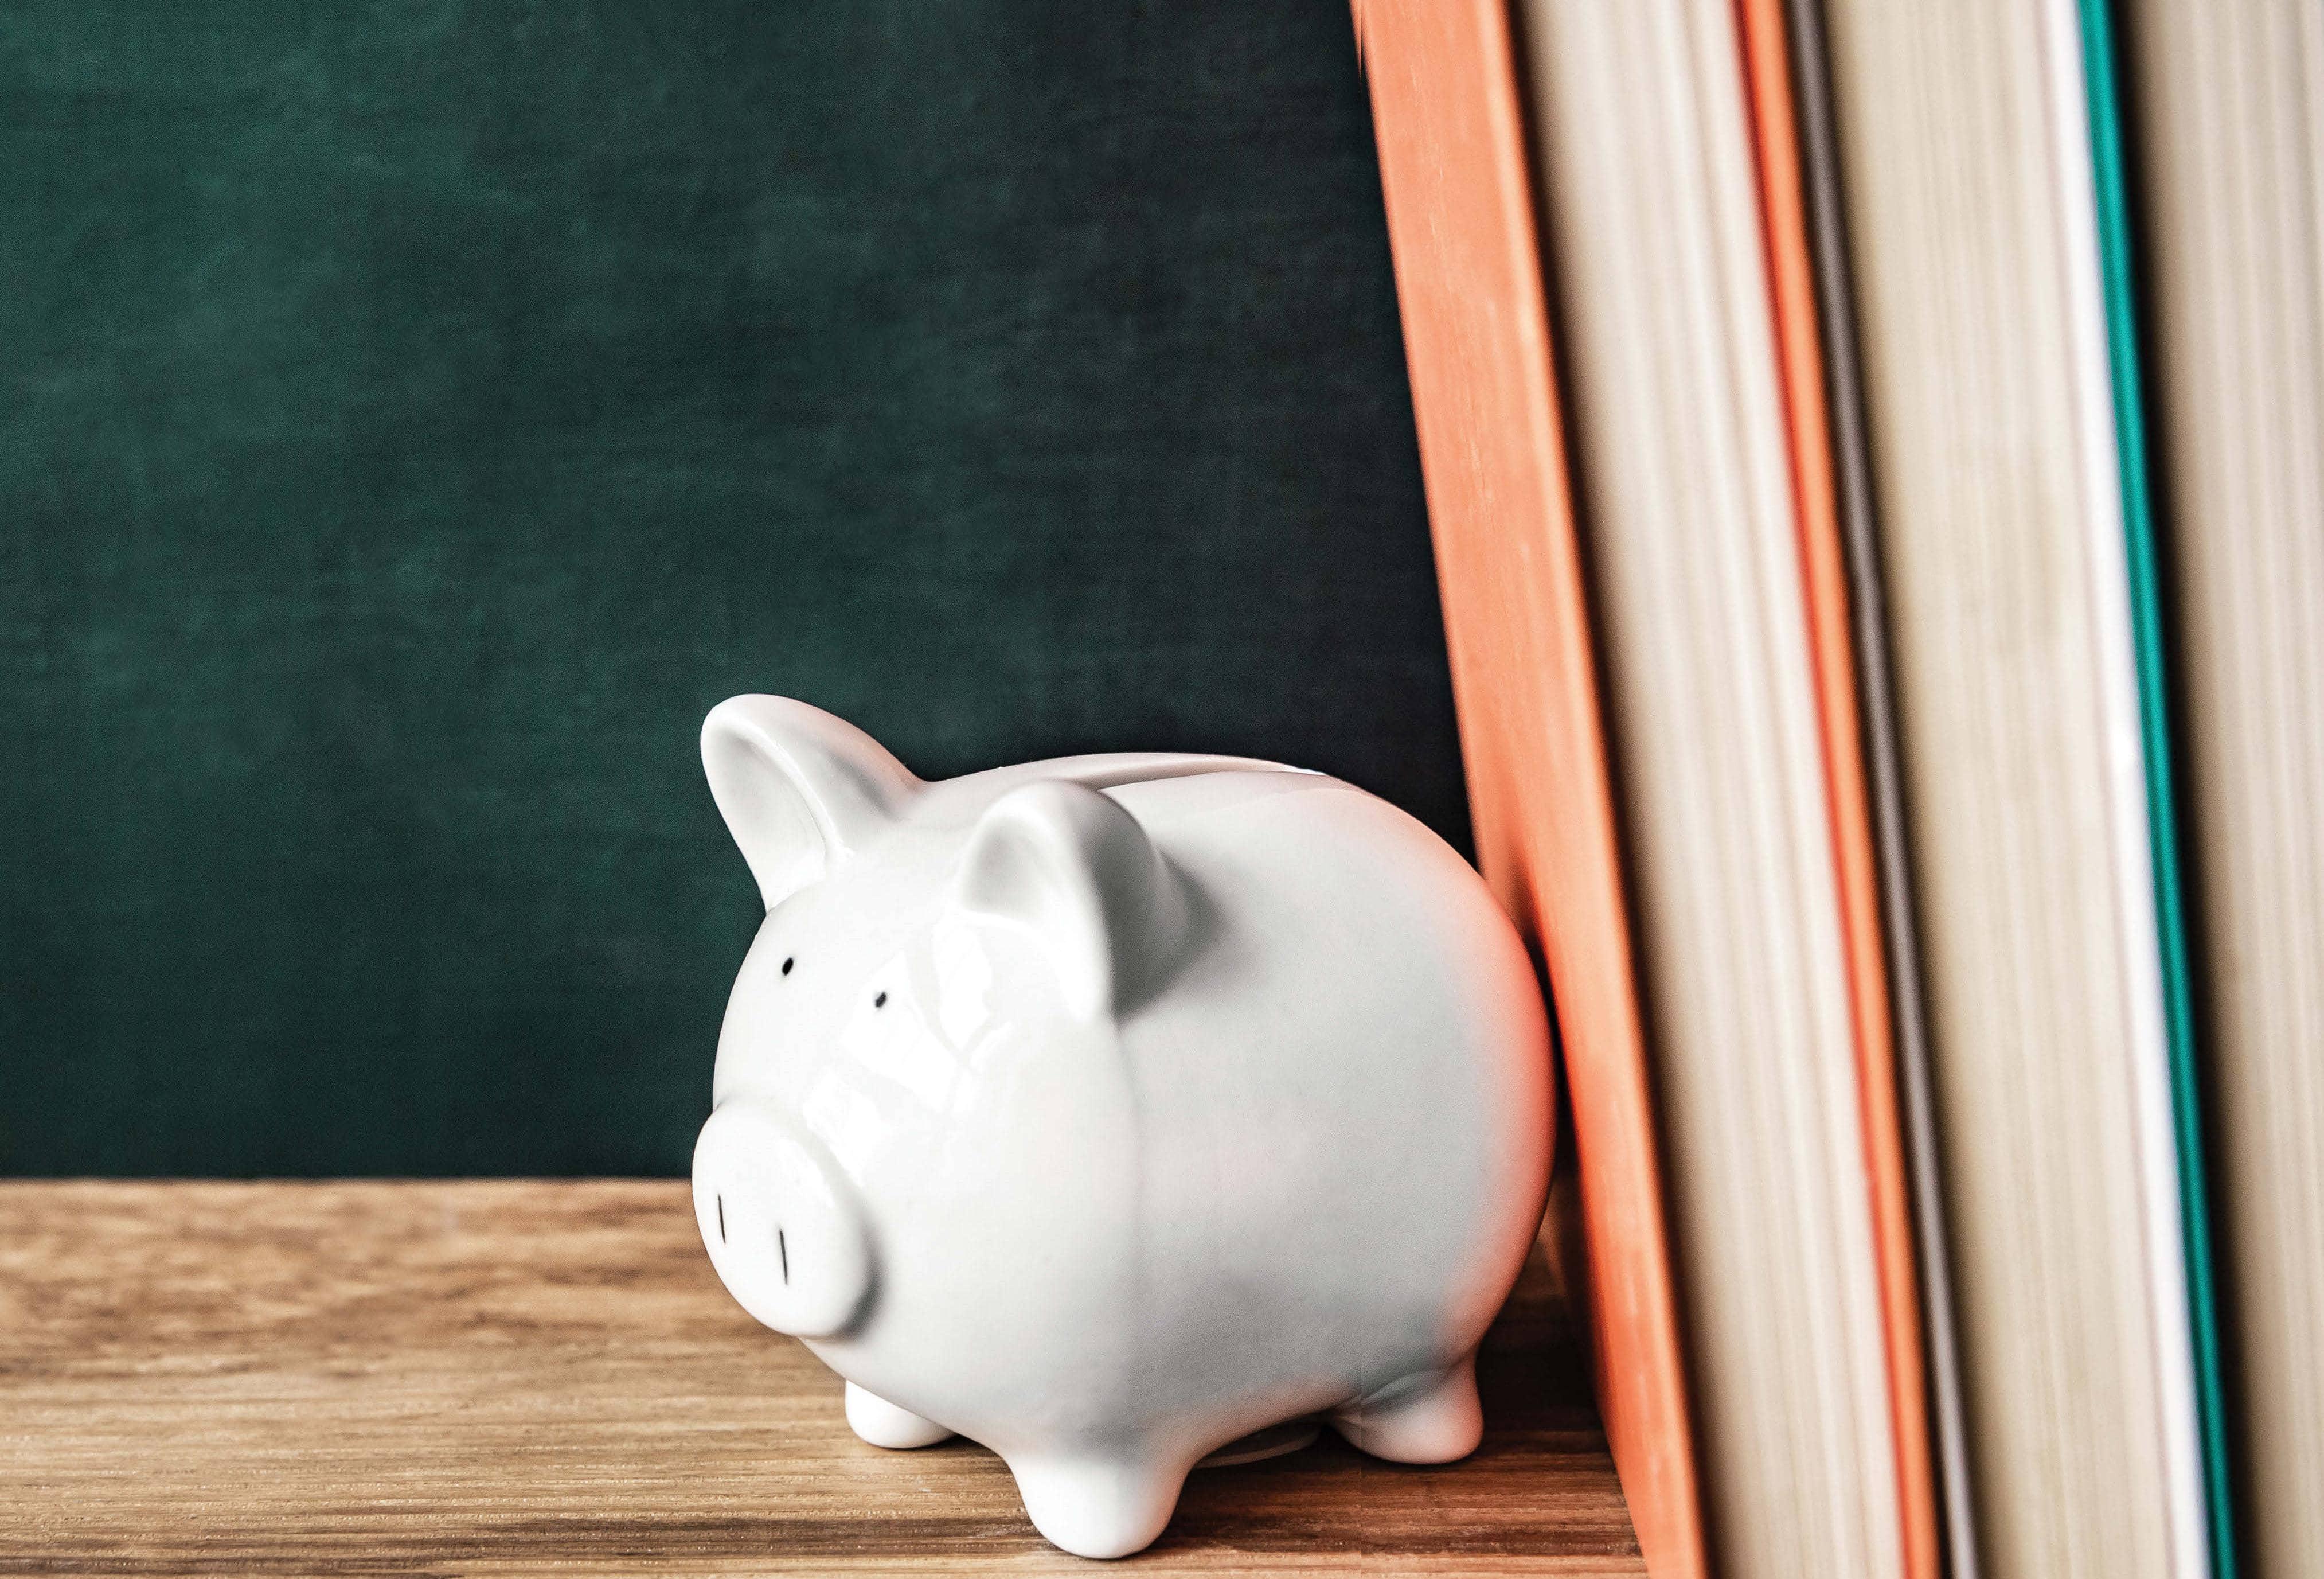 SMART WAYS TO SPEND $1,000